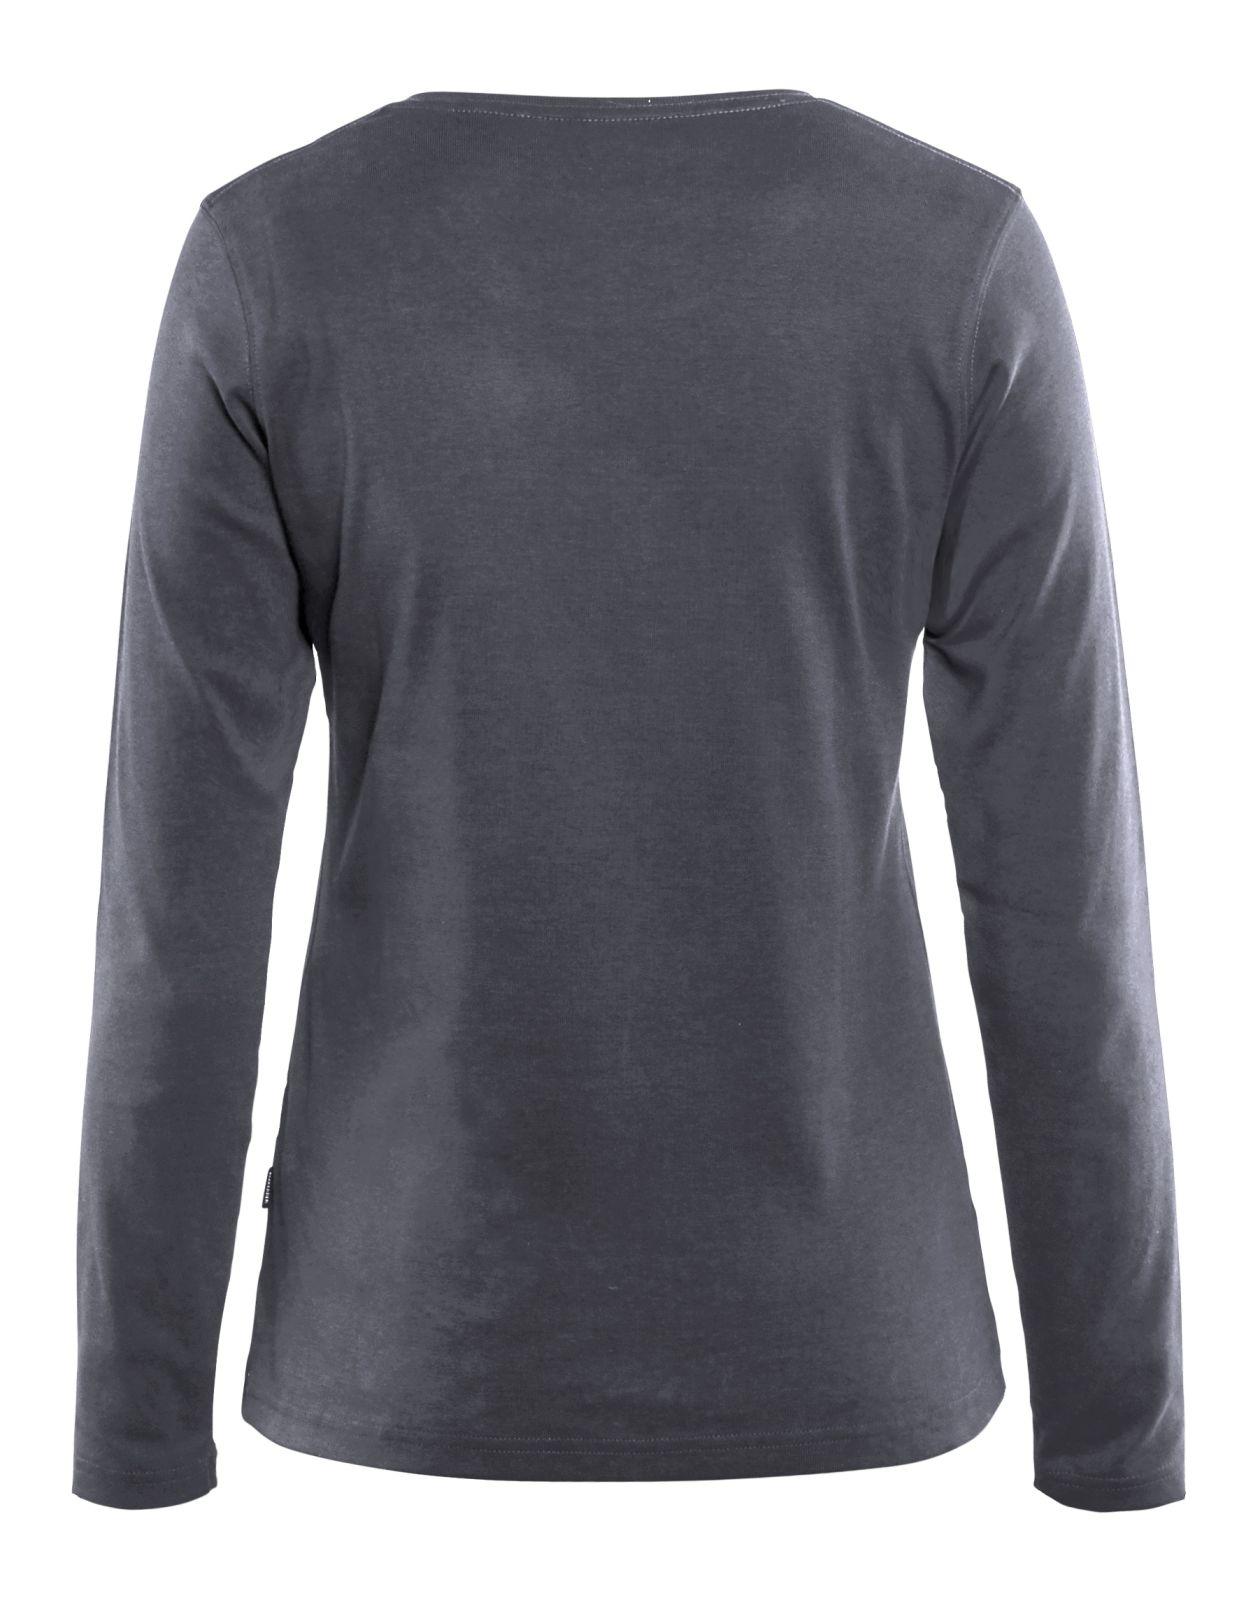 Blaklader Dames T-shirts 33011032 grijs(9400)